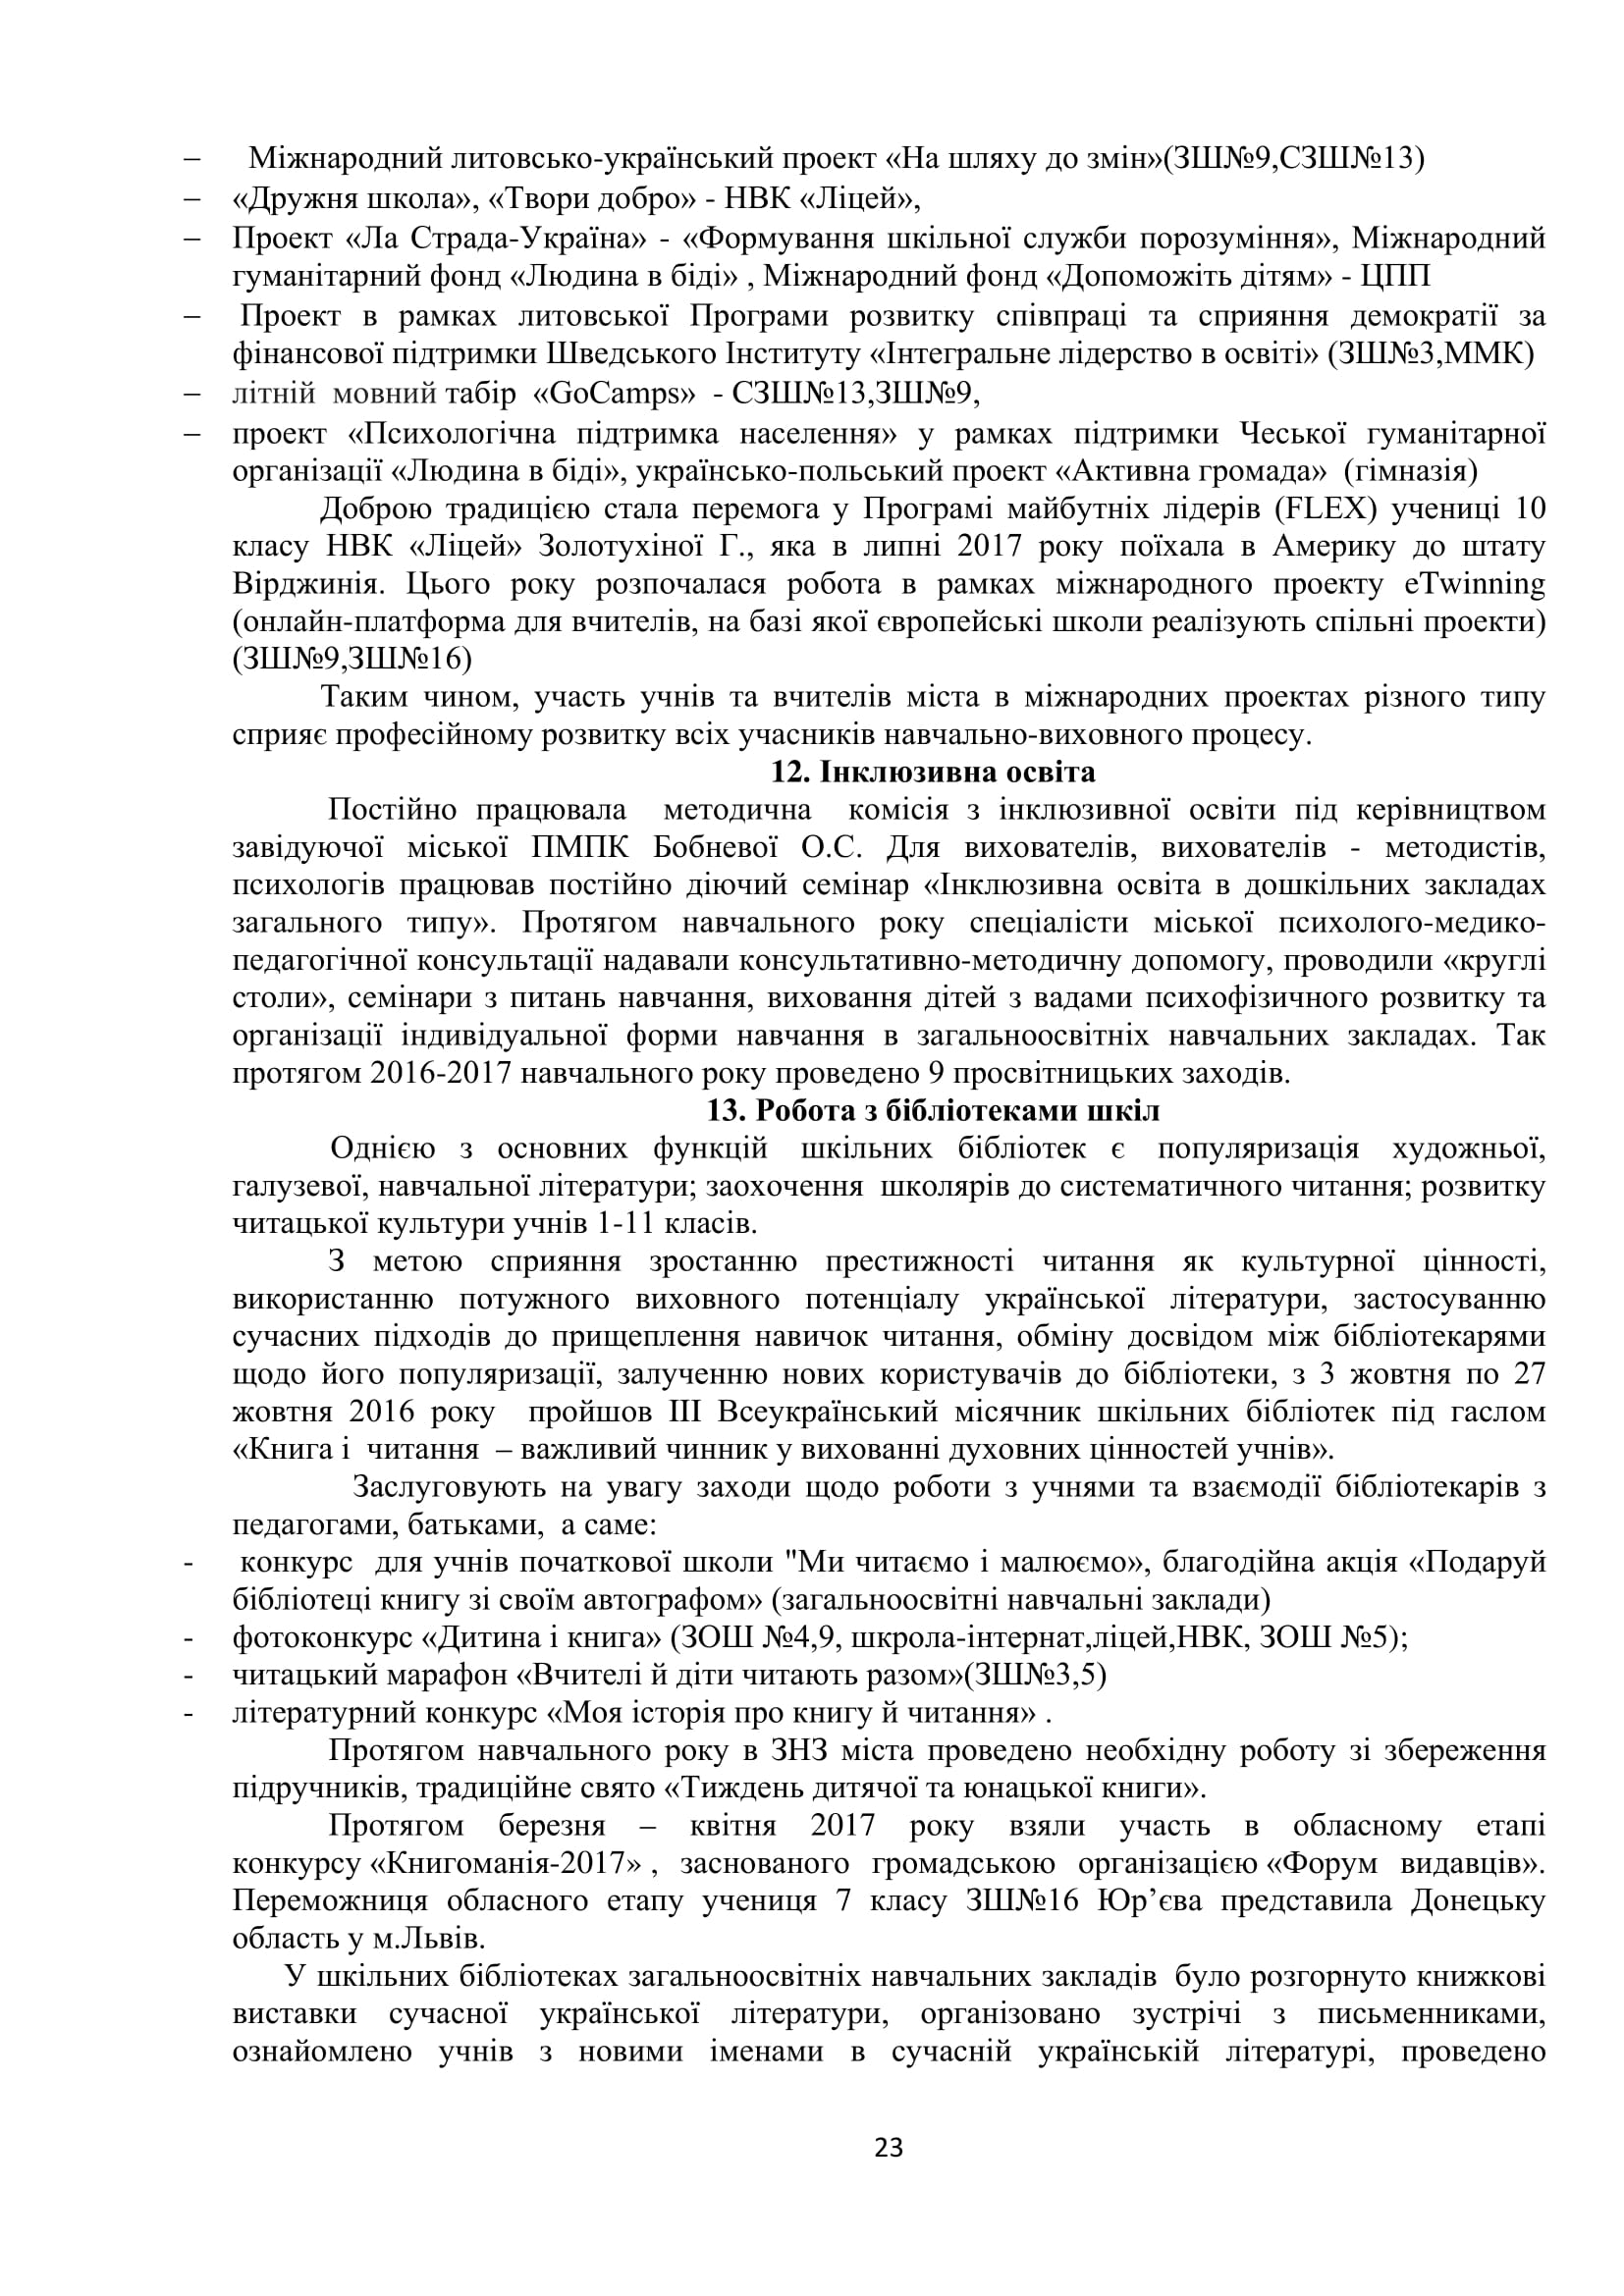 2017-2018 - ММК план роботи-24